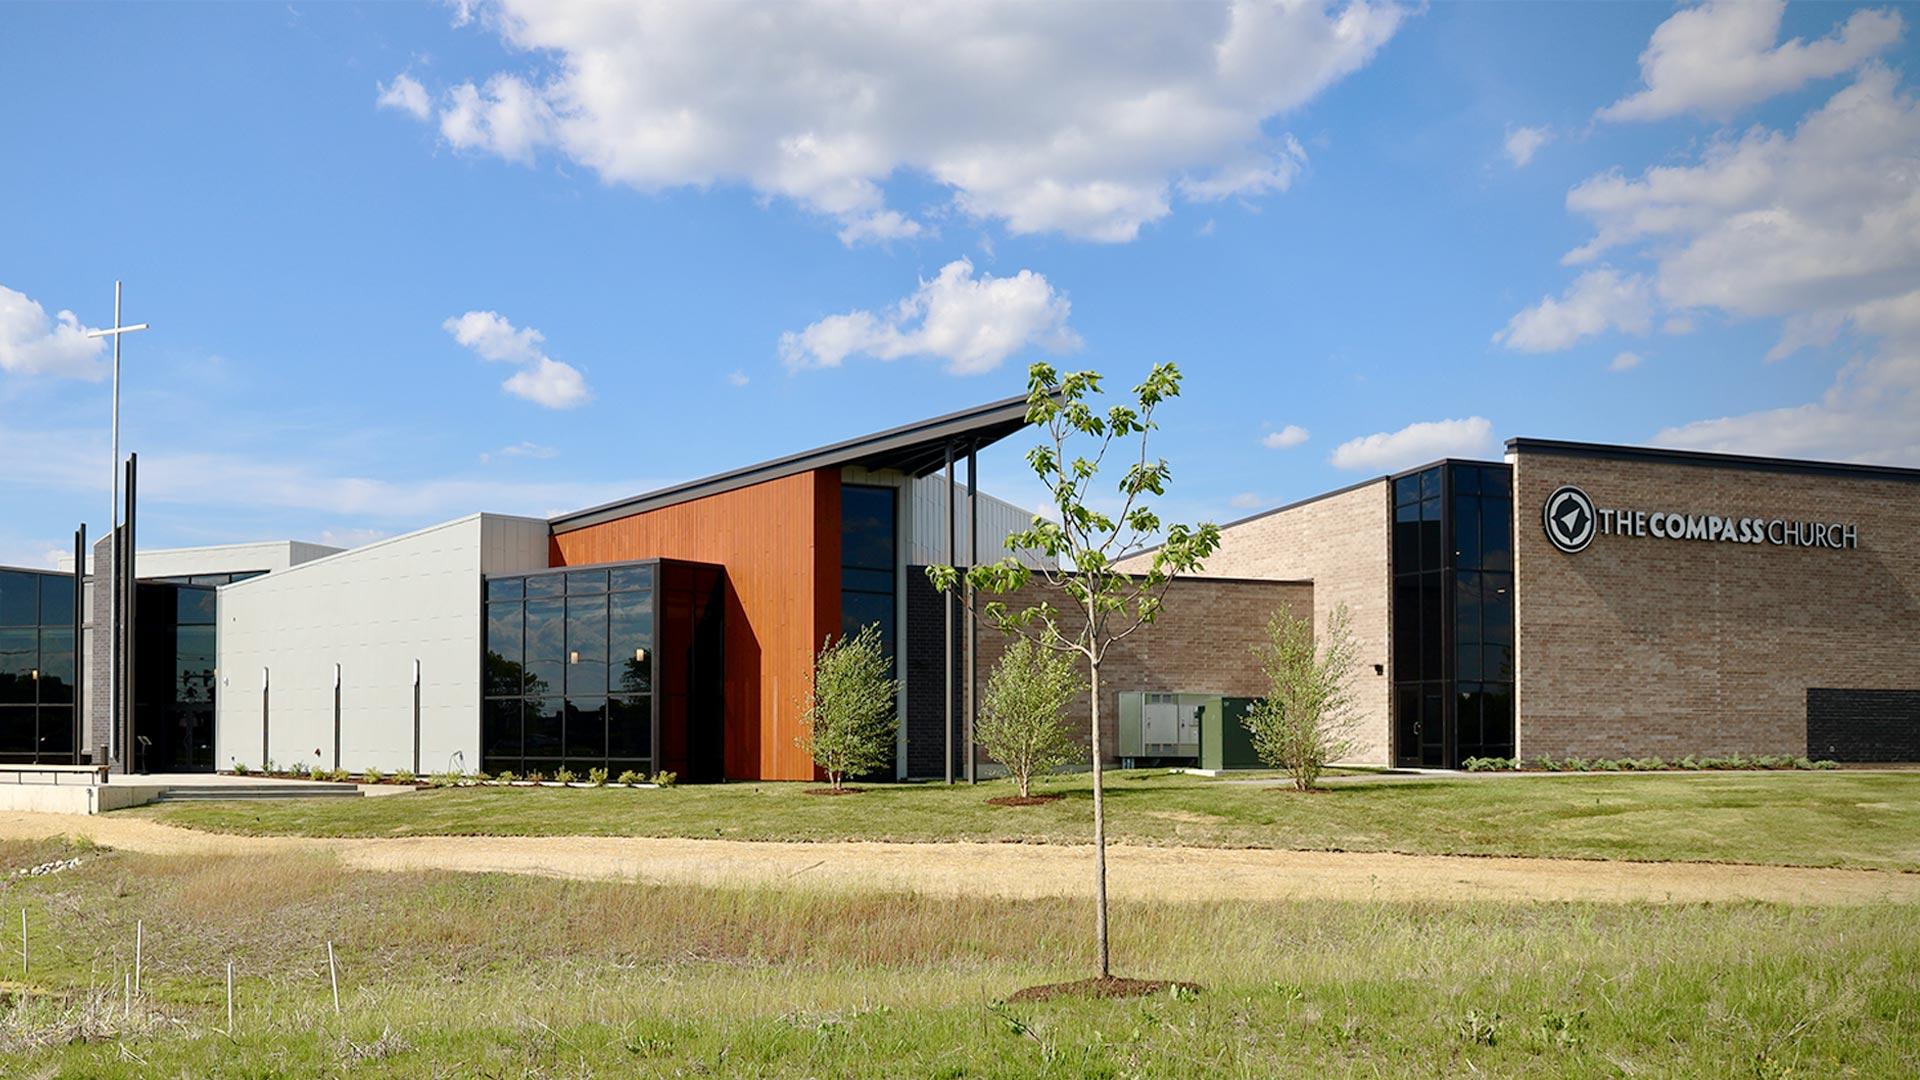 South Naperville Campus Building